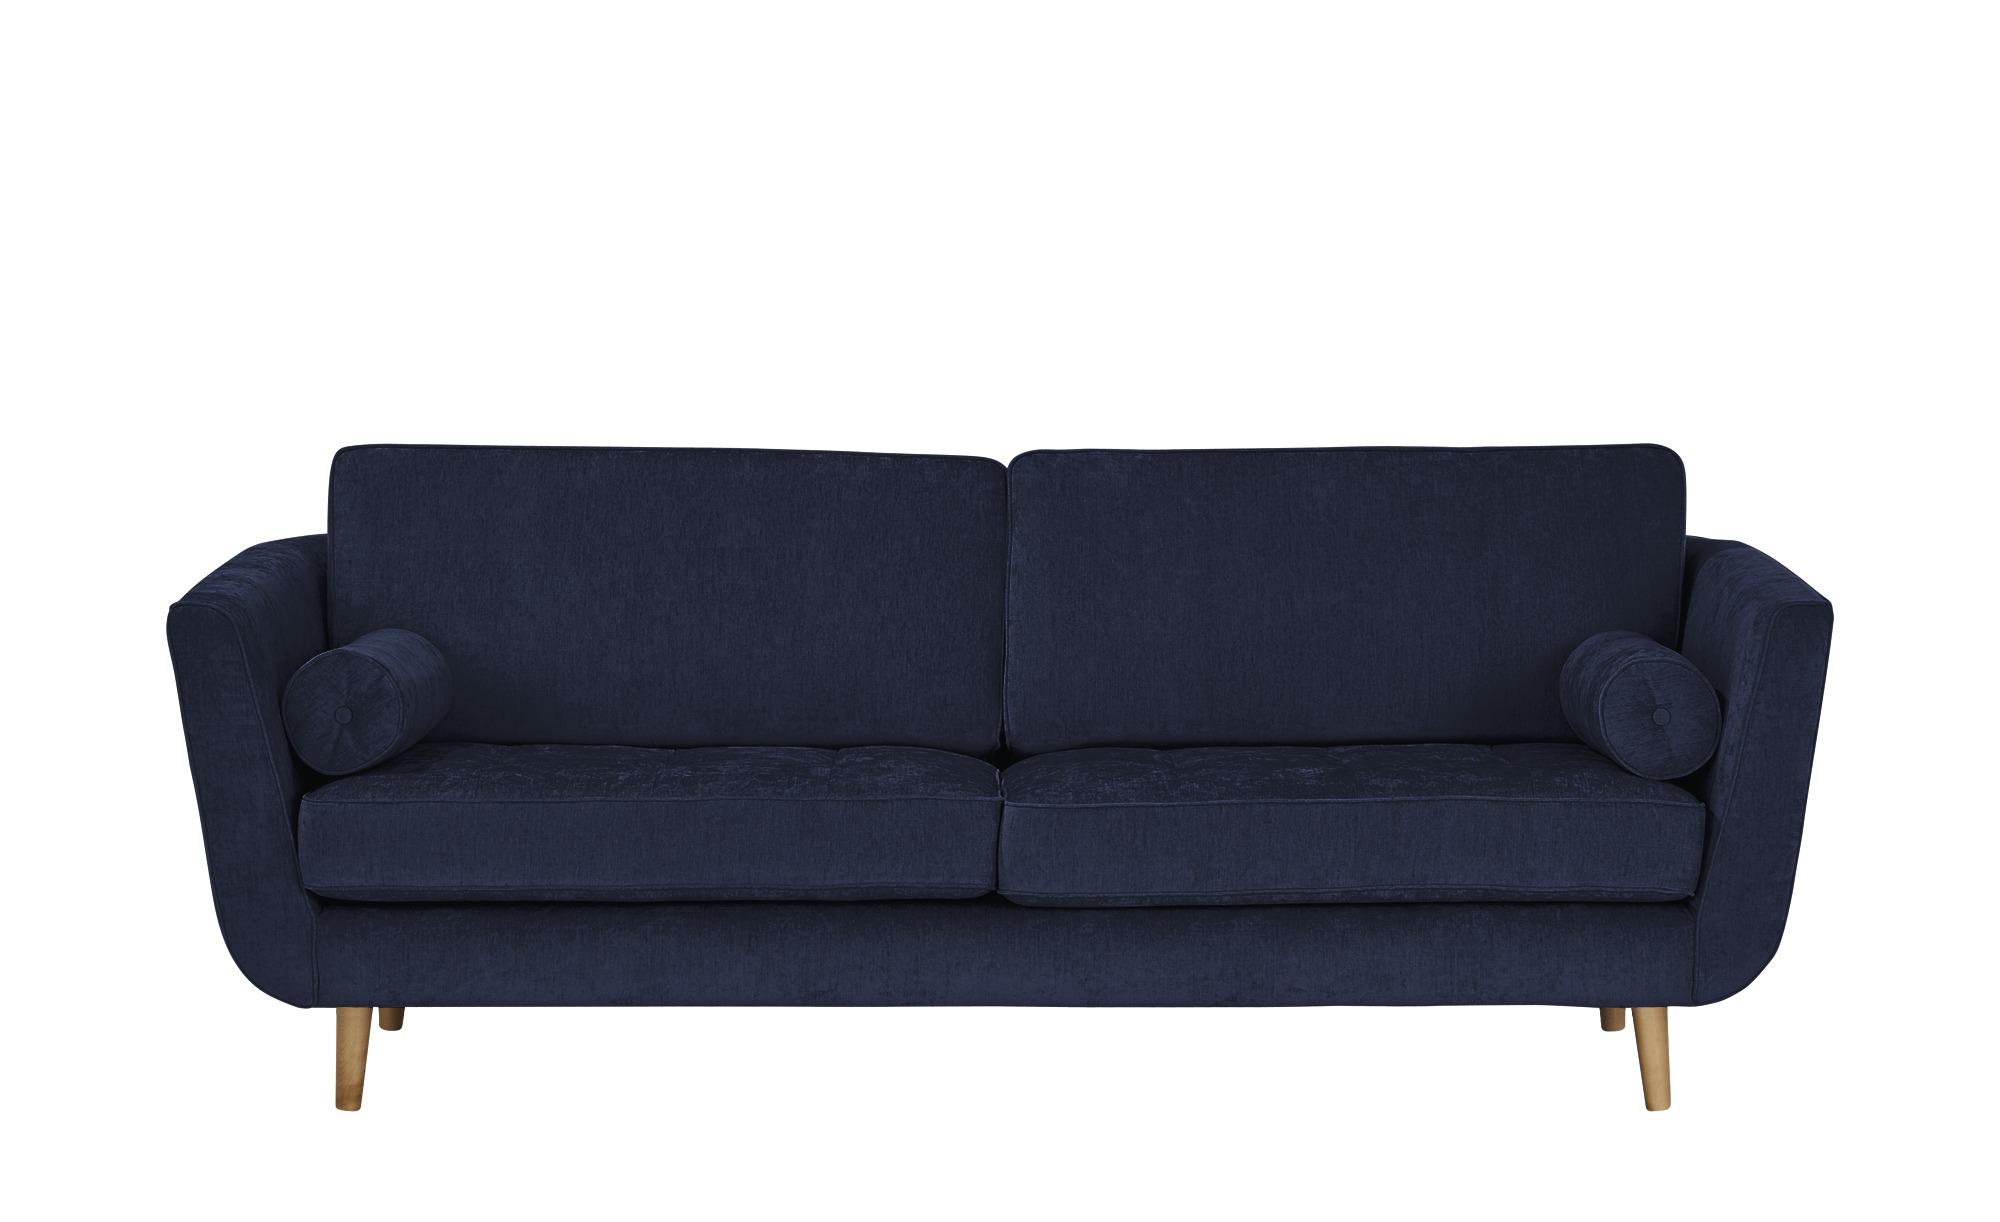 SOHO Sofa 3-sitzig  Zehra ¦ blau ¦ Maße (cm): B: 226 H: 85 T: 96 Polstermöbel > Sofas > 3-Sitzer - Höffner